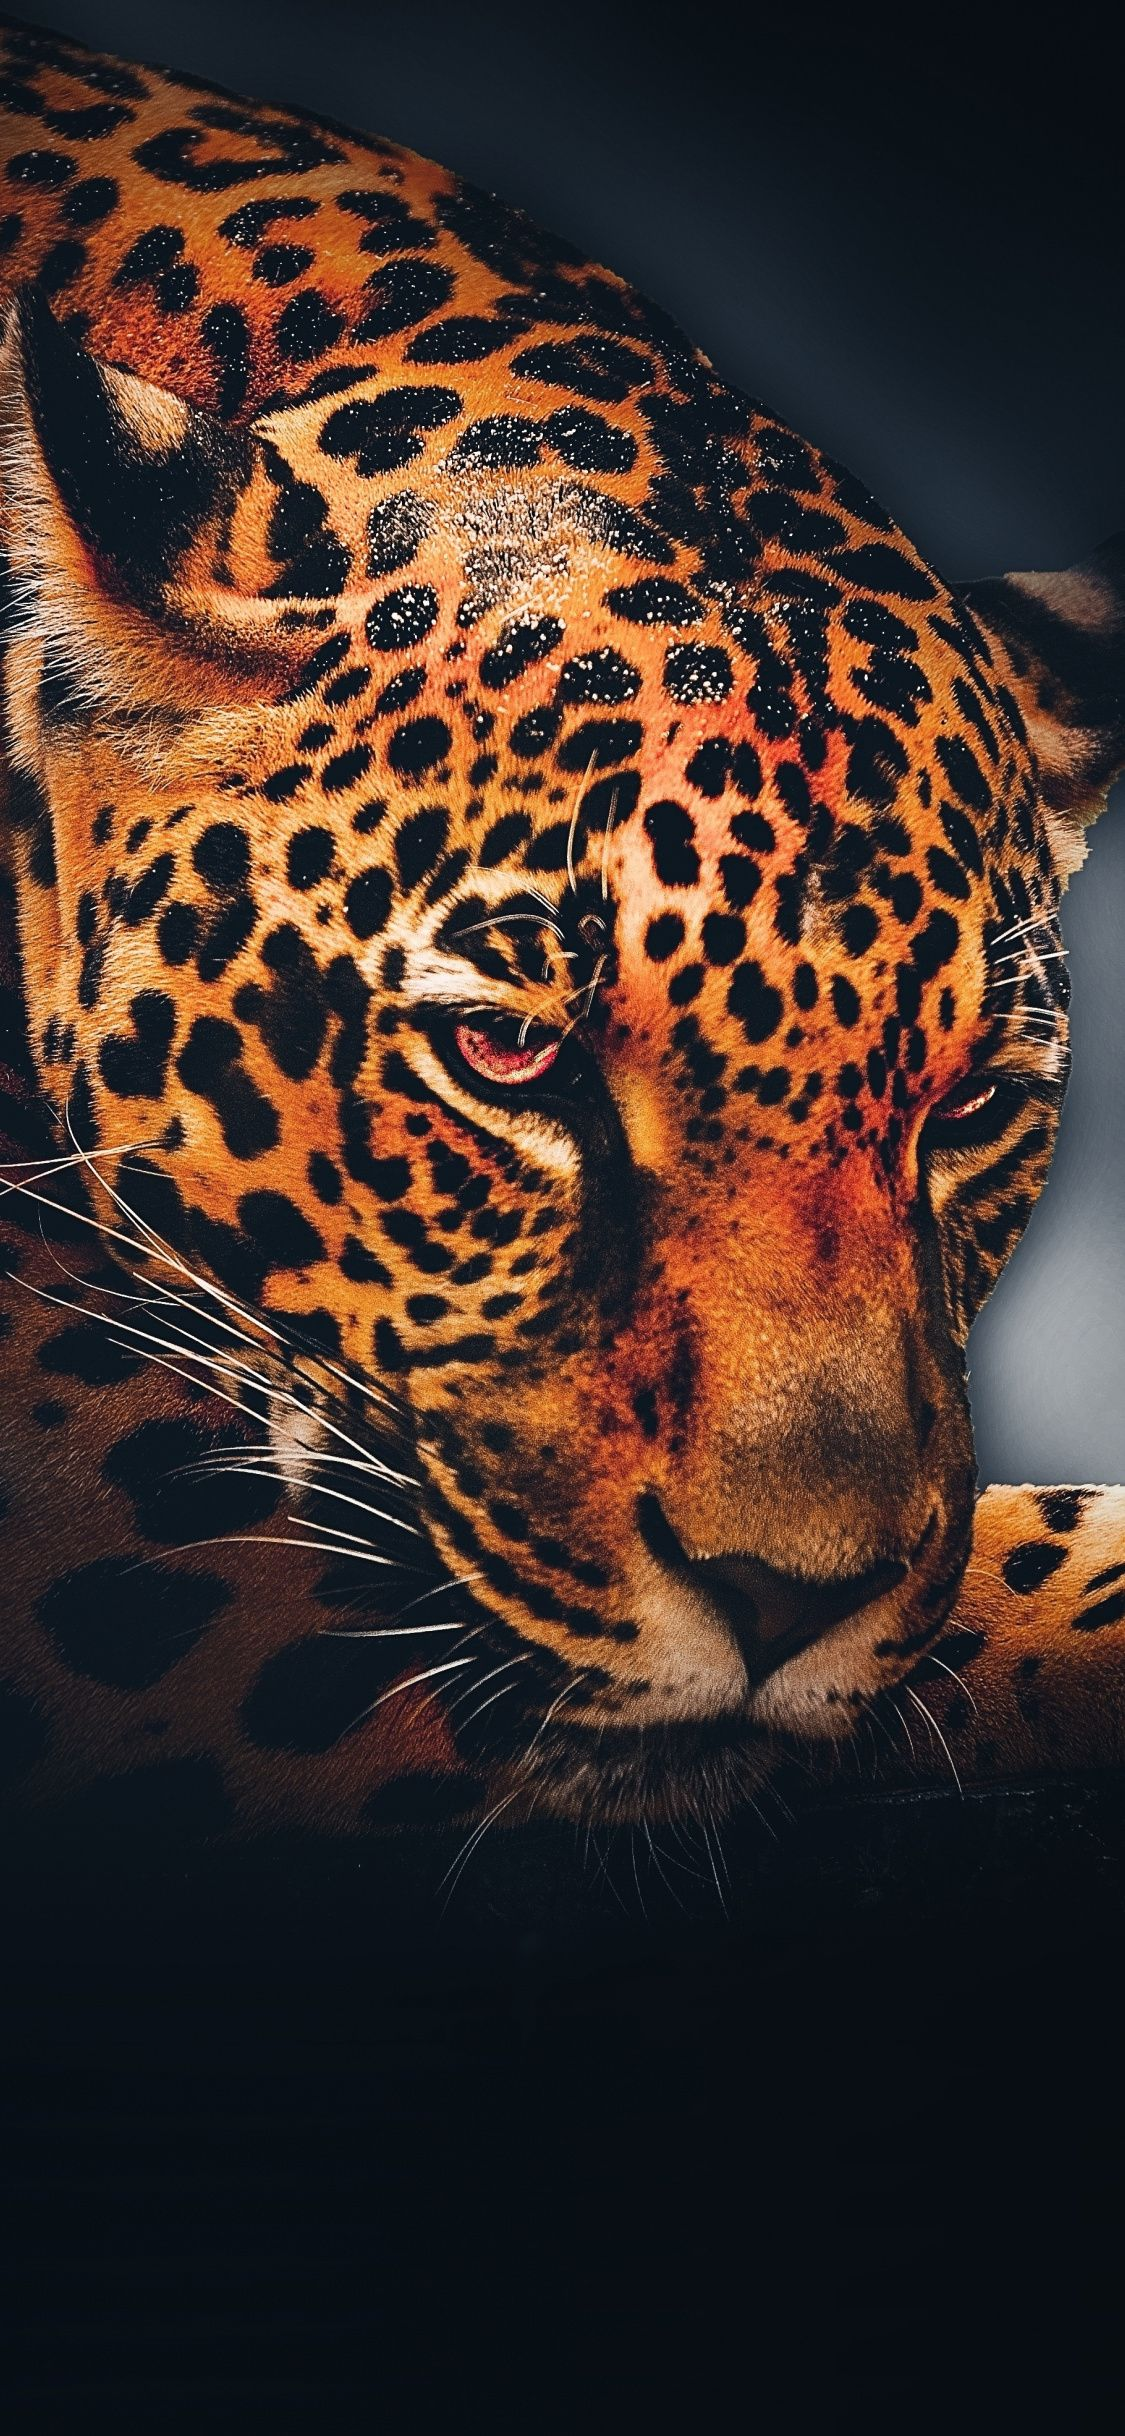 1125x2436 Leopard Animal Relaxed Portrait Wallpaper Animal Wallpaper Wildlife Wallpaper Animals Beautiful